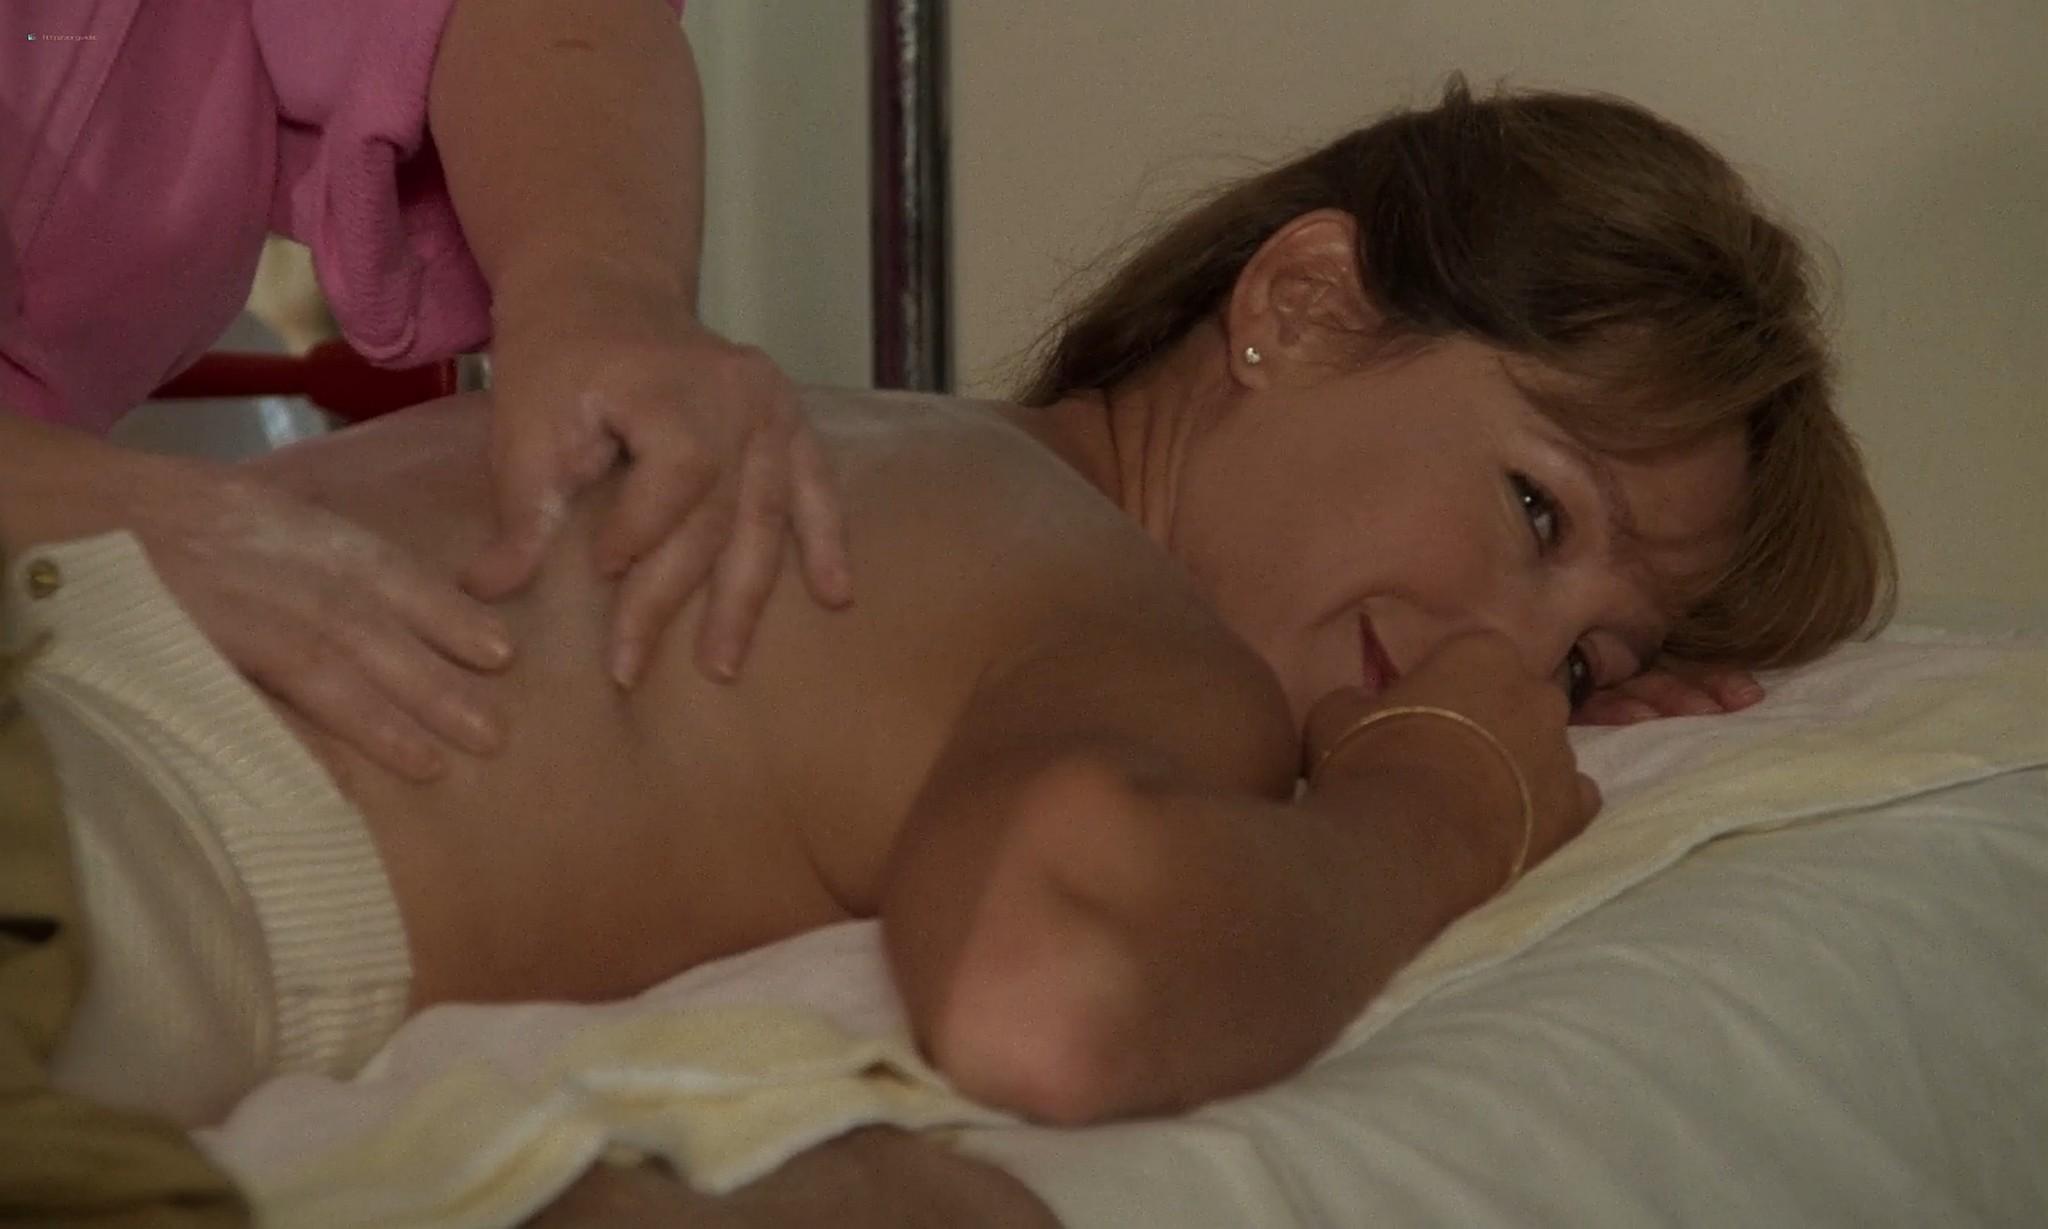 Nathalie Baye nude in the shower En toute innocence FR 1988 1080p BluRay 6